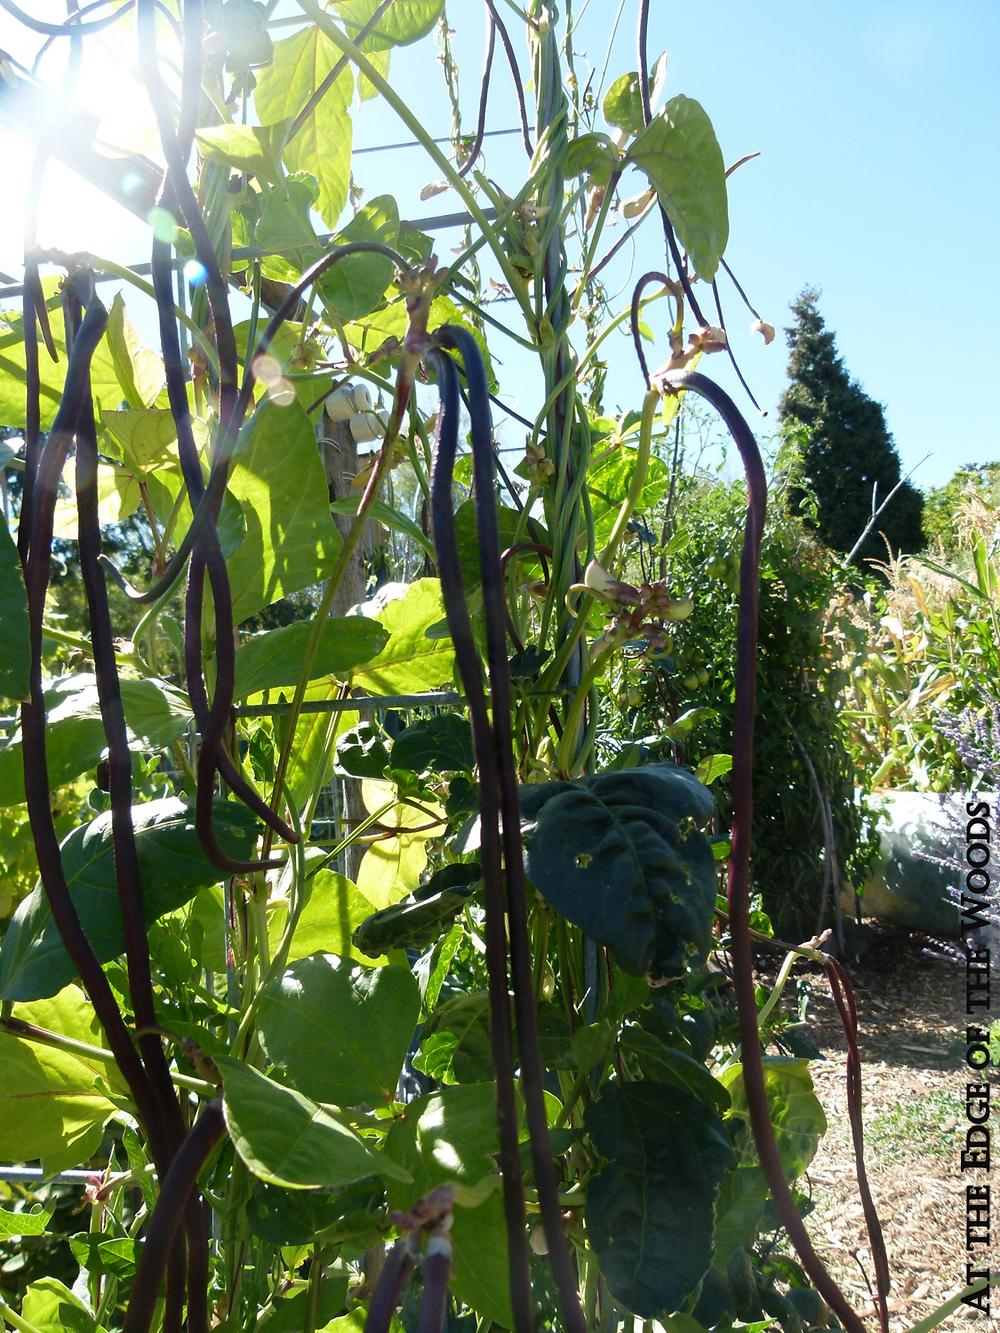 yard long beans in the outdoor garden